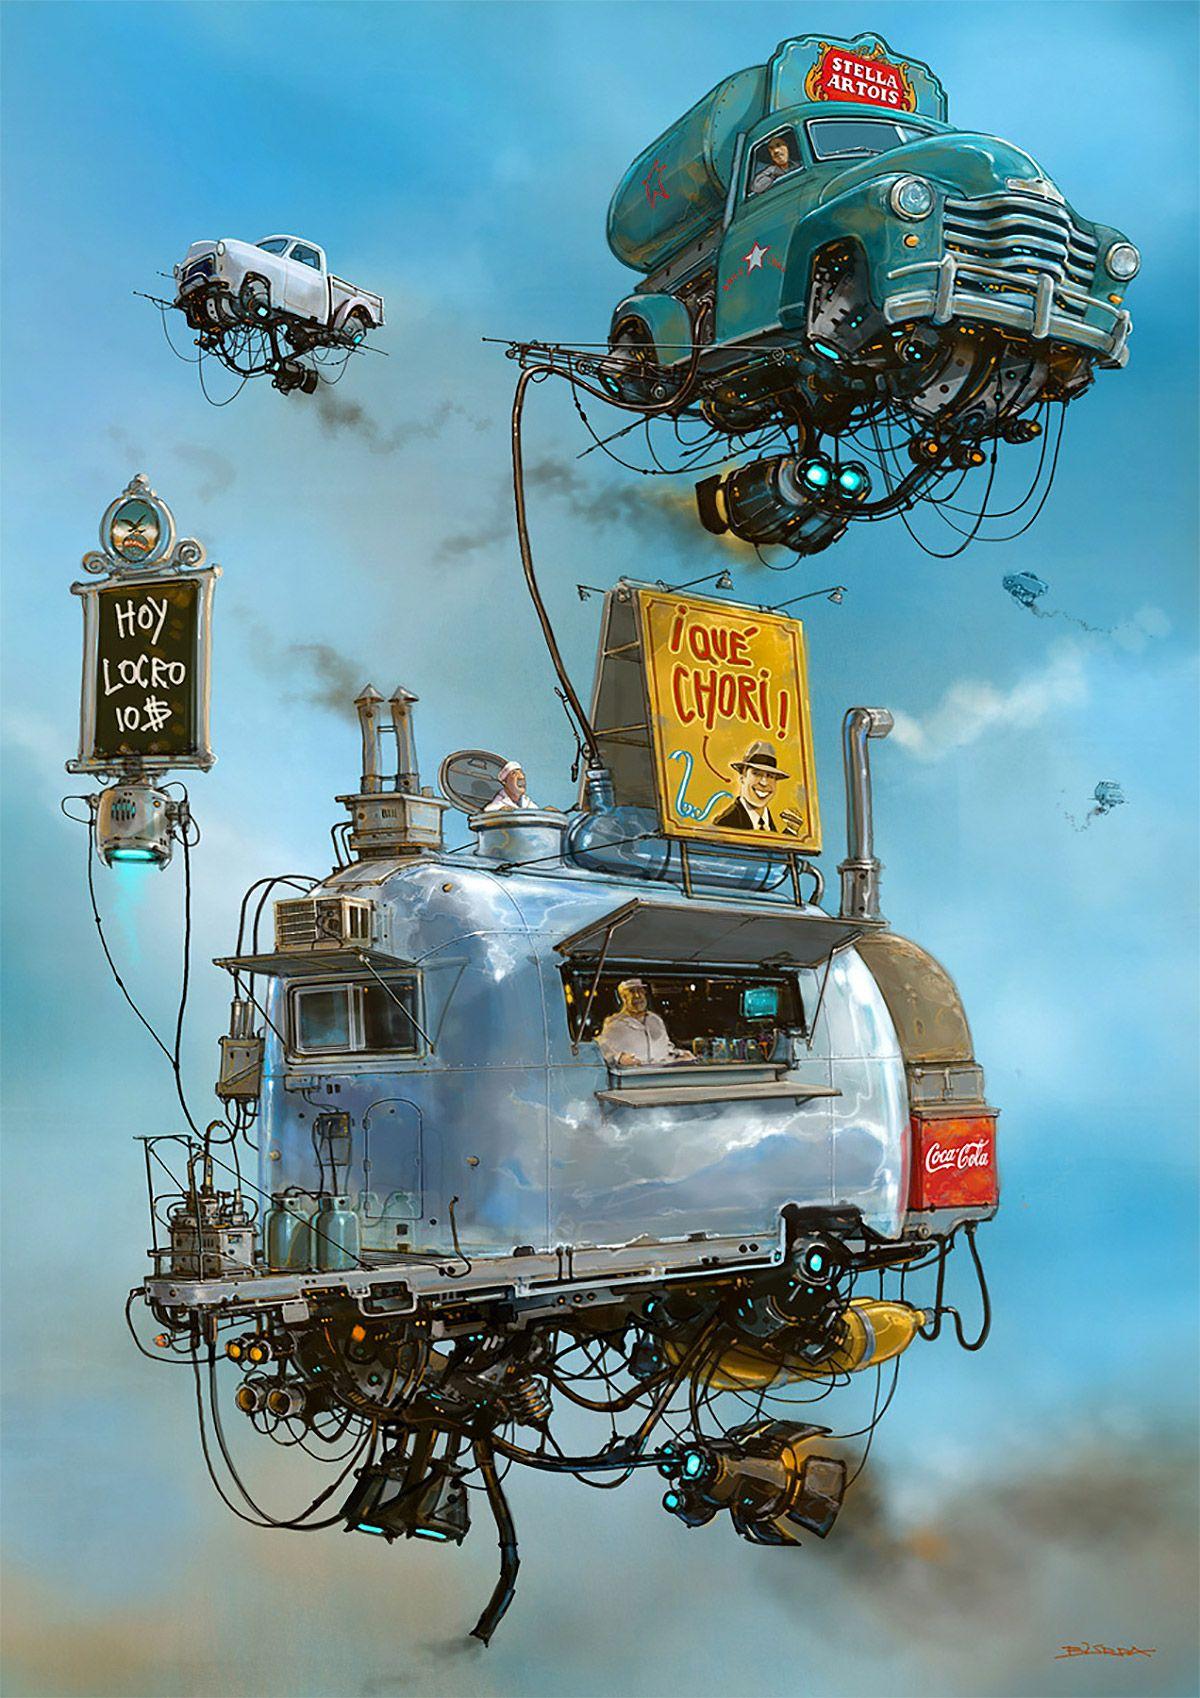 Flying Car Illustrations by Alejandro Burdisio – Inspiration Grid   Design Inspiration #illustration #illustrationinspiration #drawing #conceptart #flyingcars #retrofuturistic #inspirationgrid